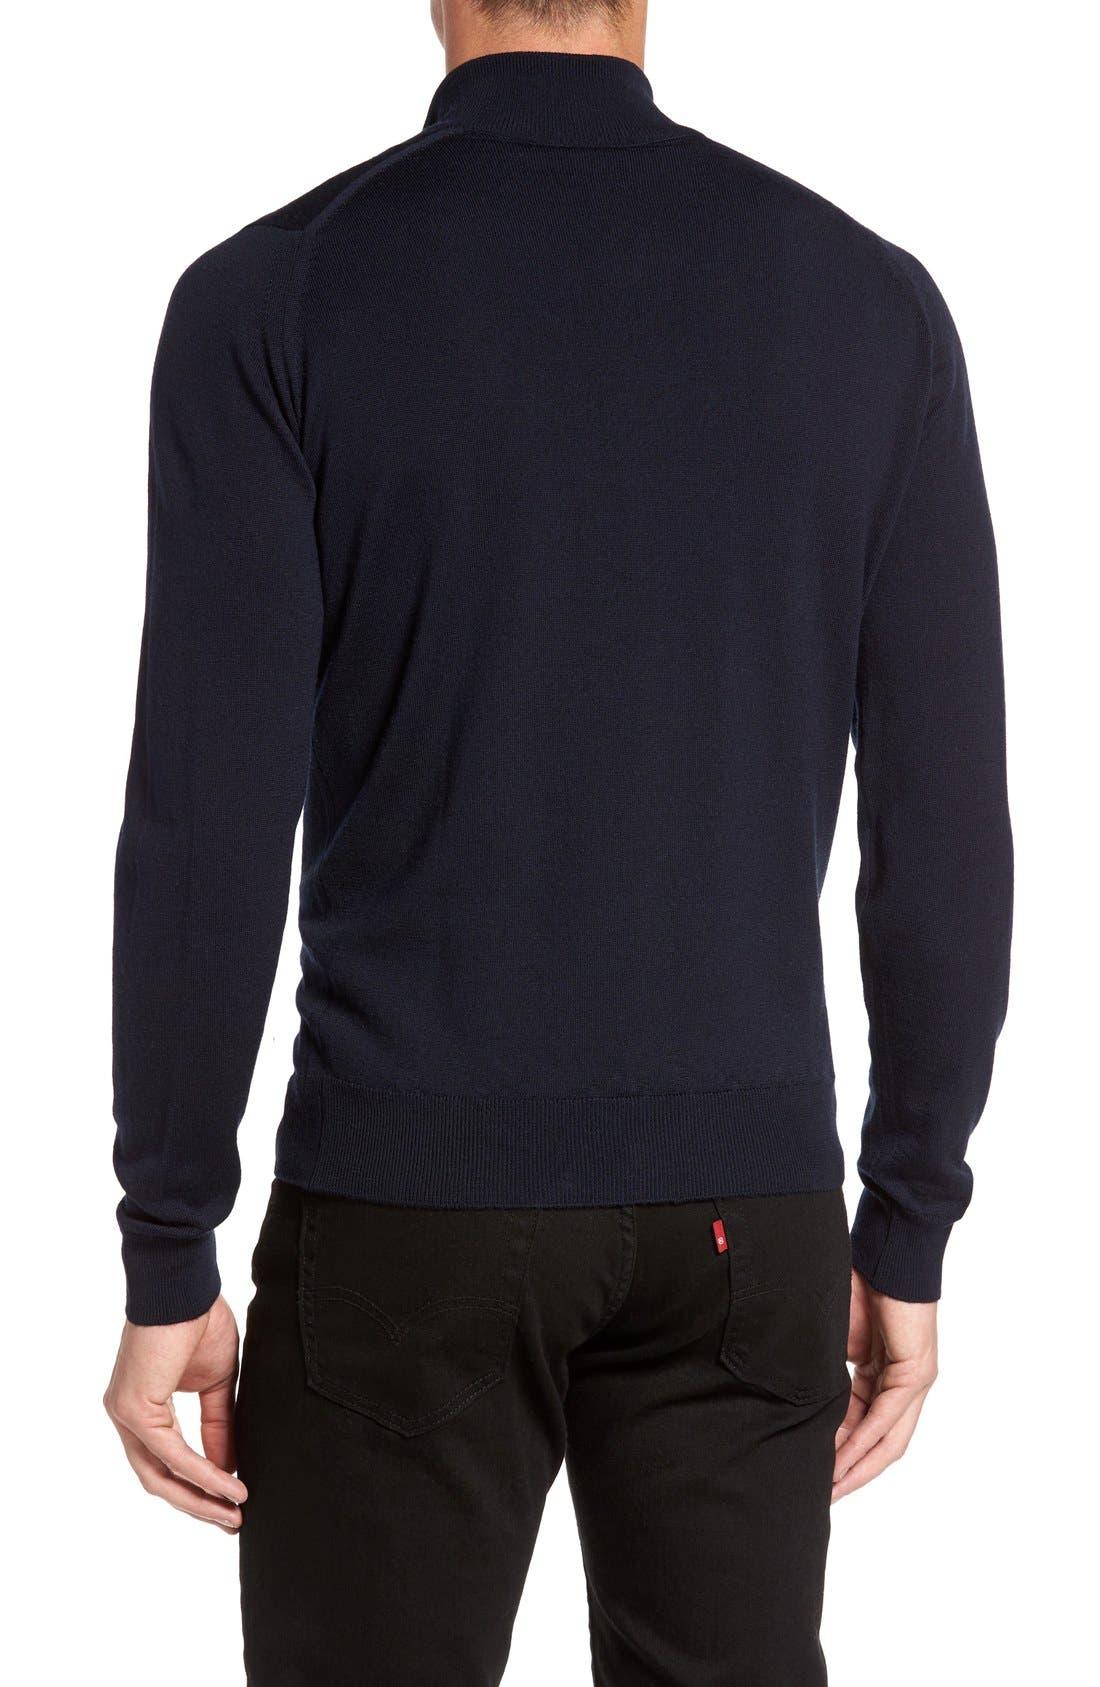 'Tapton' Quarter Zip Merino Wool Sweater,                             Alternate thumbnail 2, color,                             Midnight